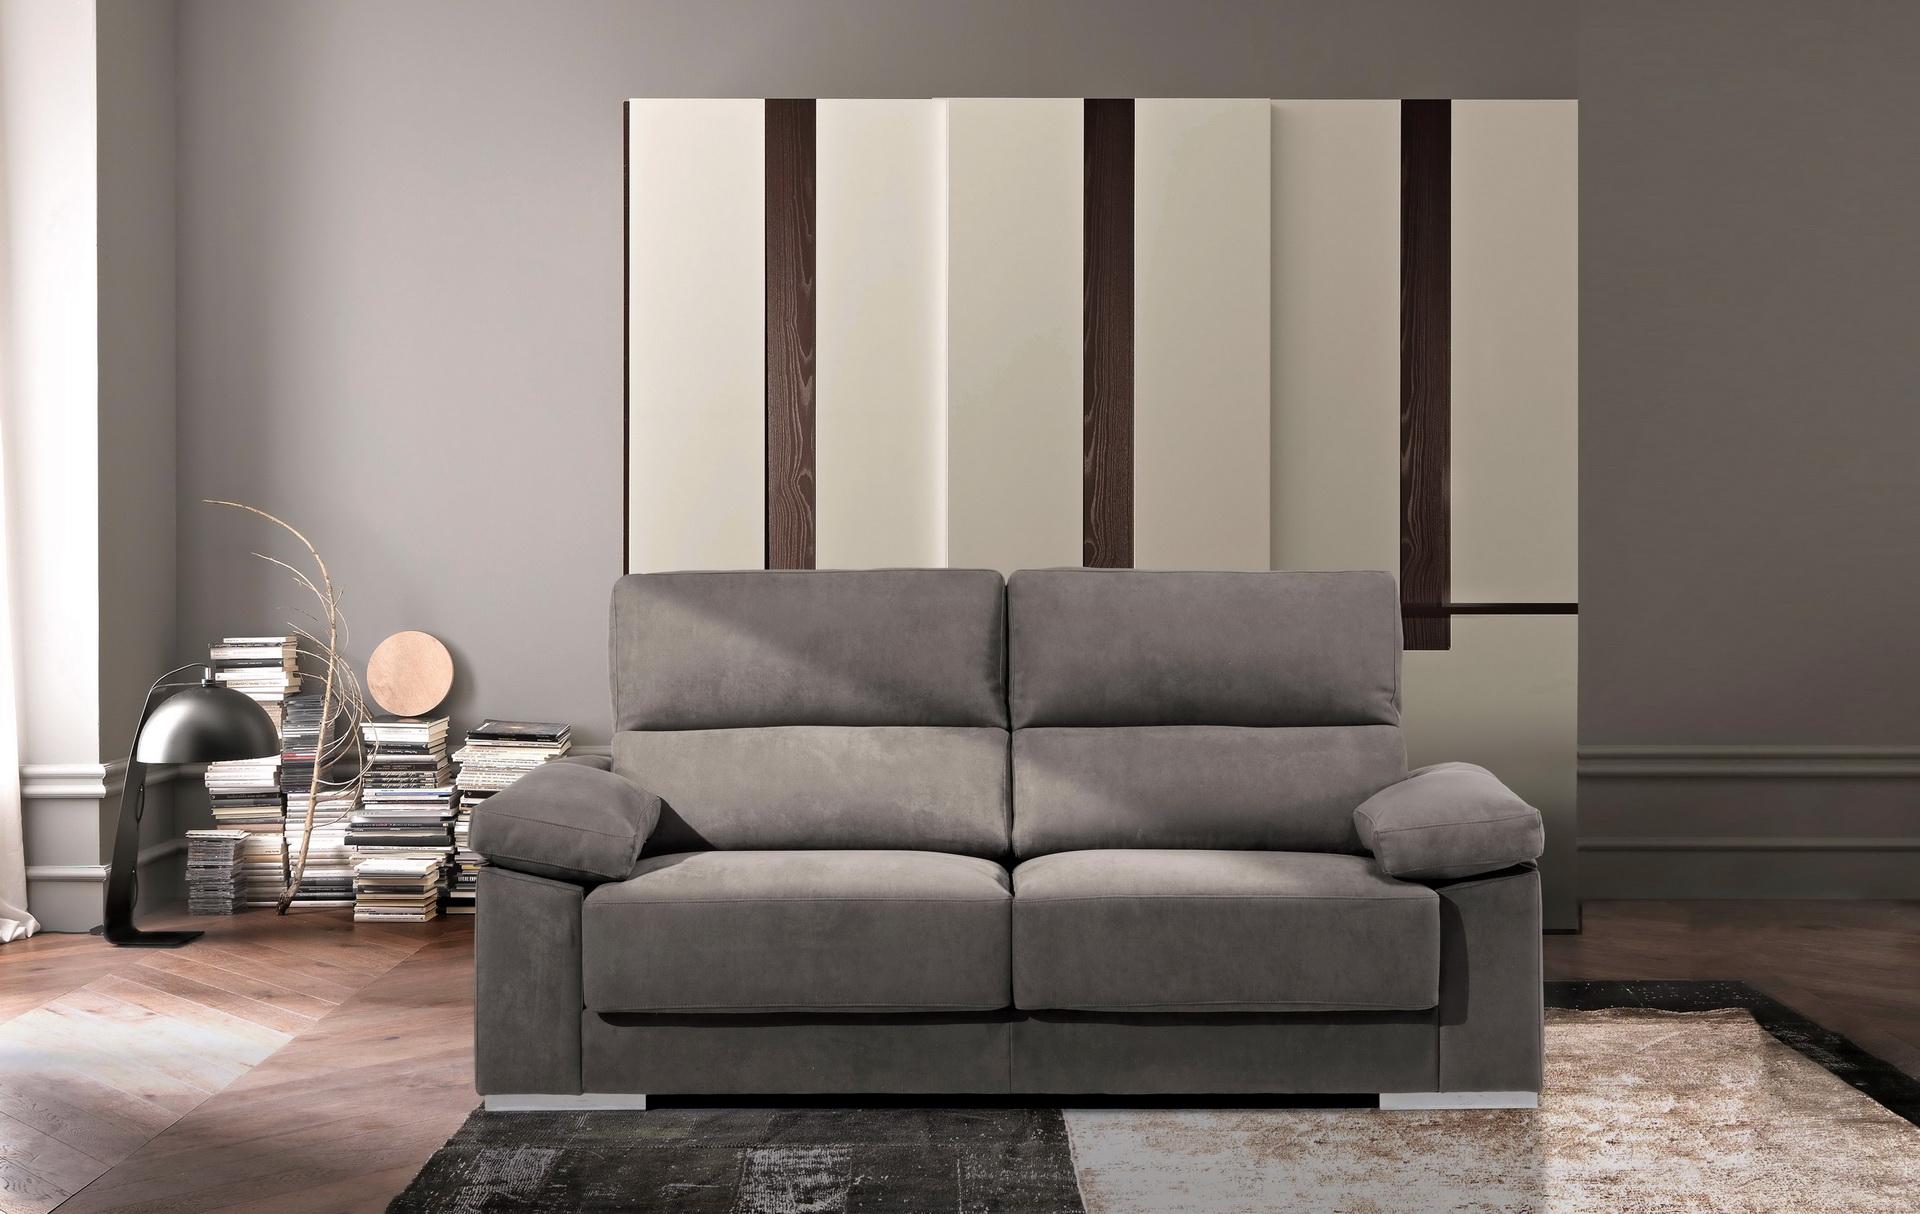 SOFA MODULAR MD. KIRA FONDO REDUCIDO 80 by Piccolo Confort en muebles antoñán® León